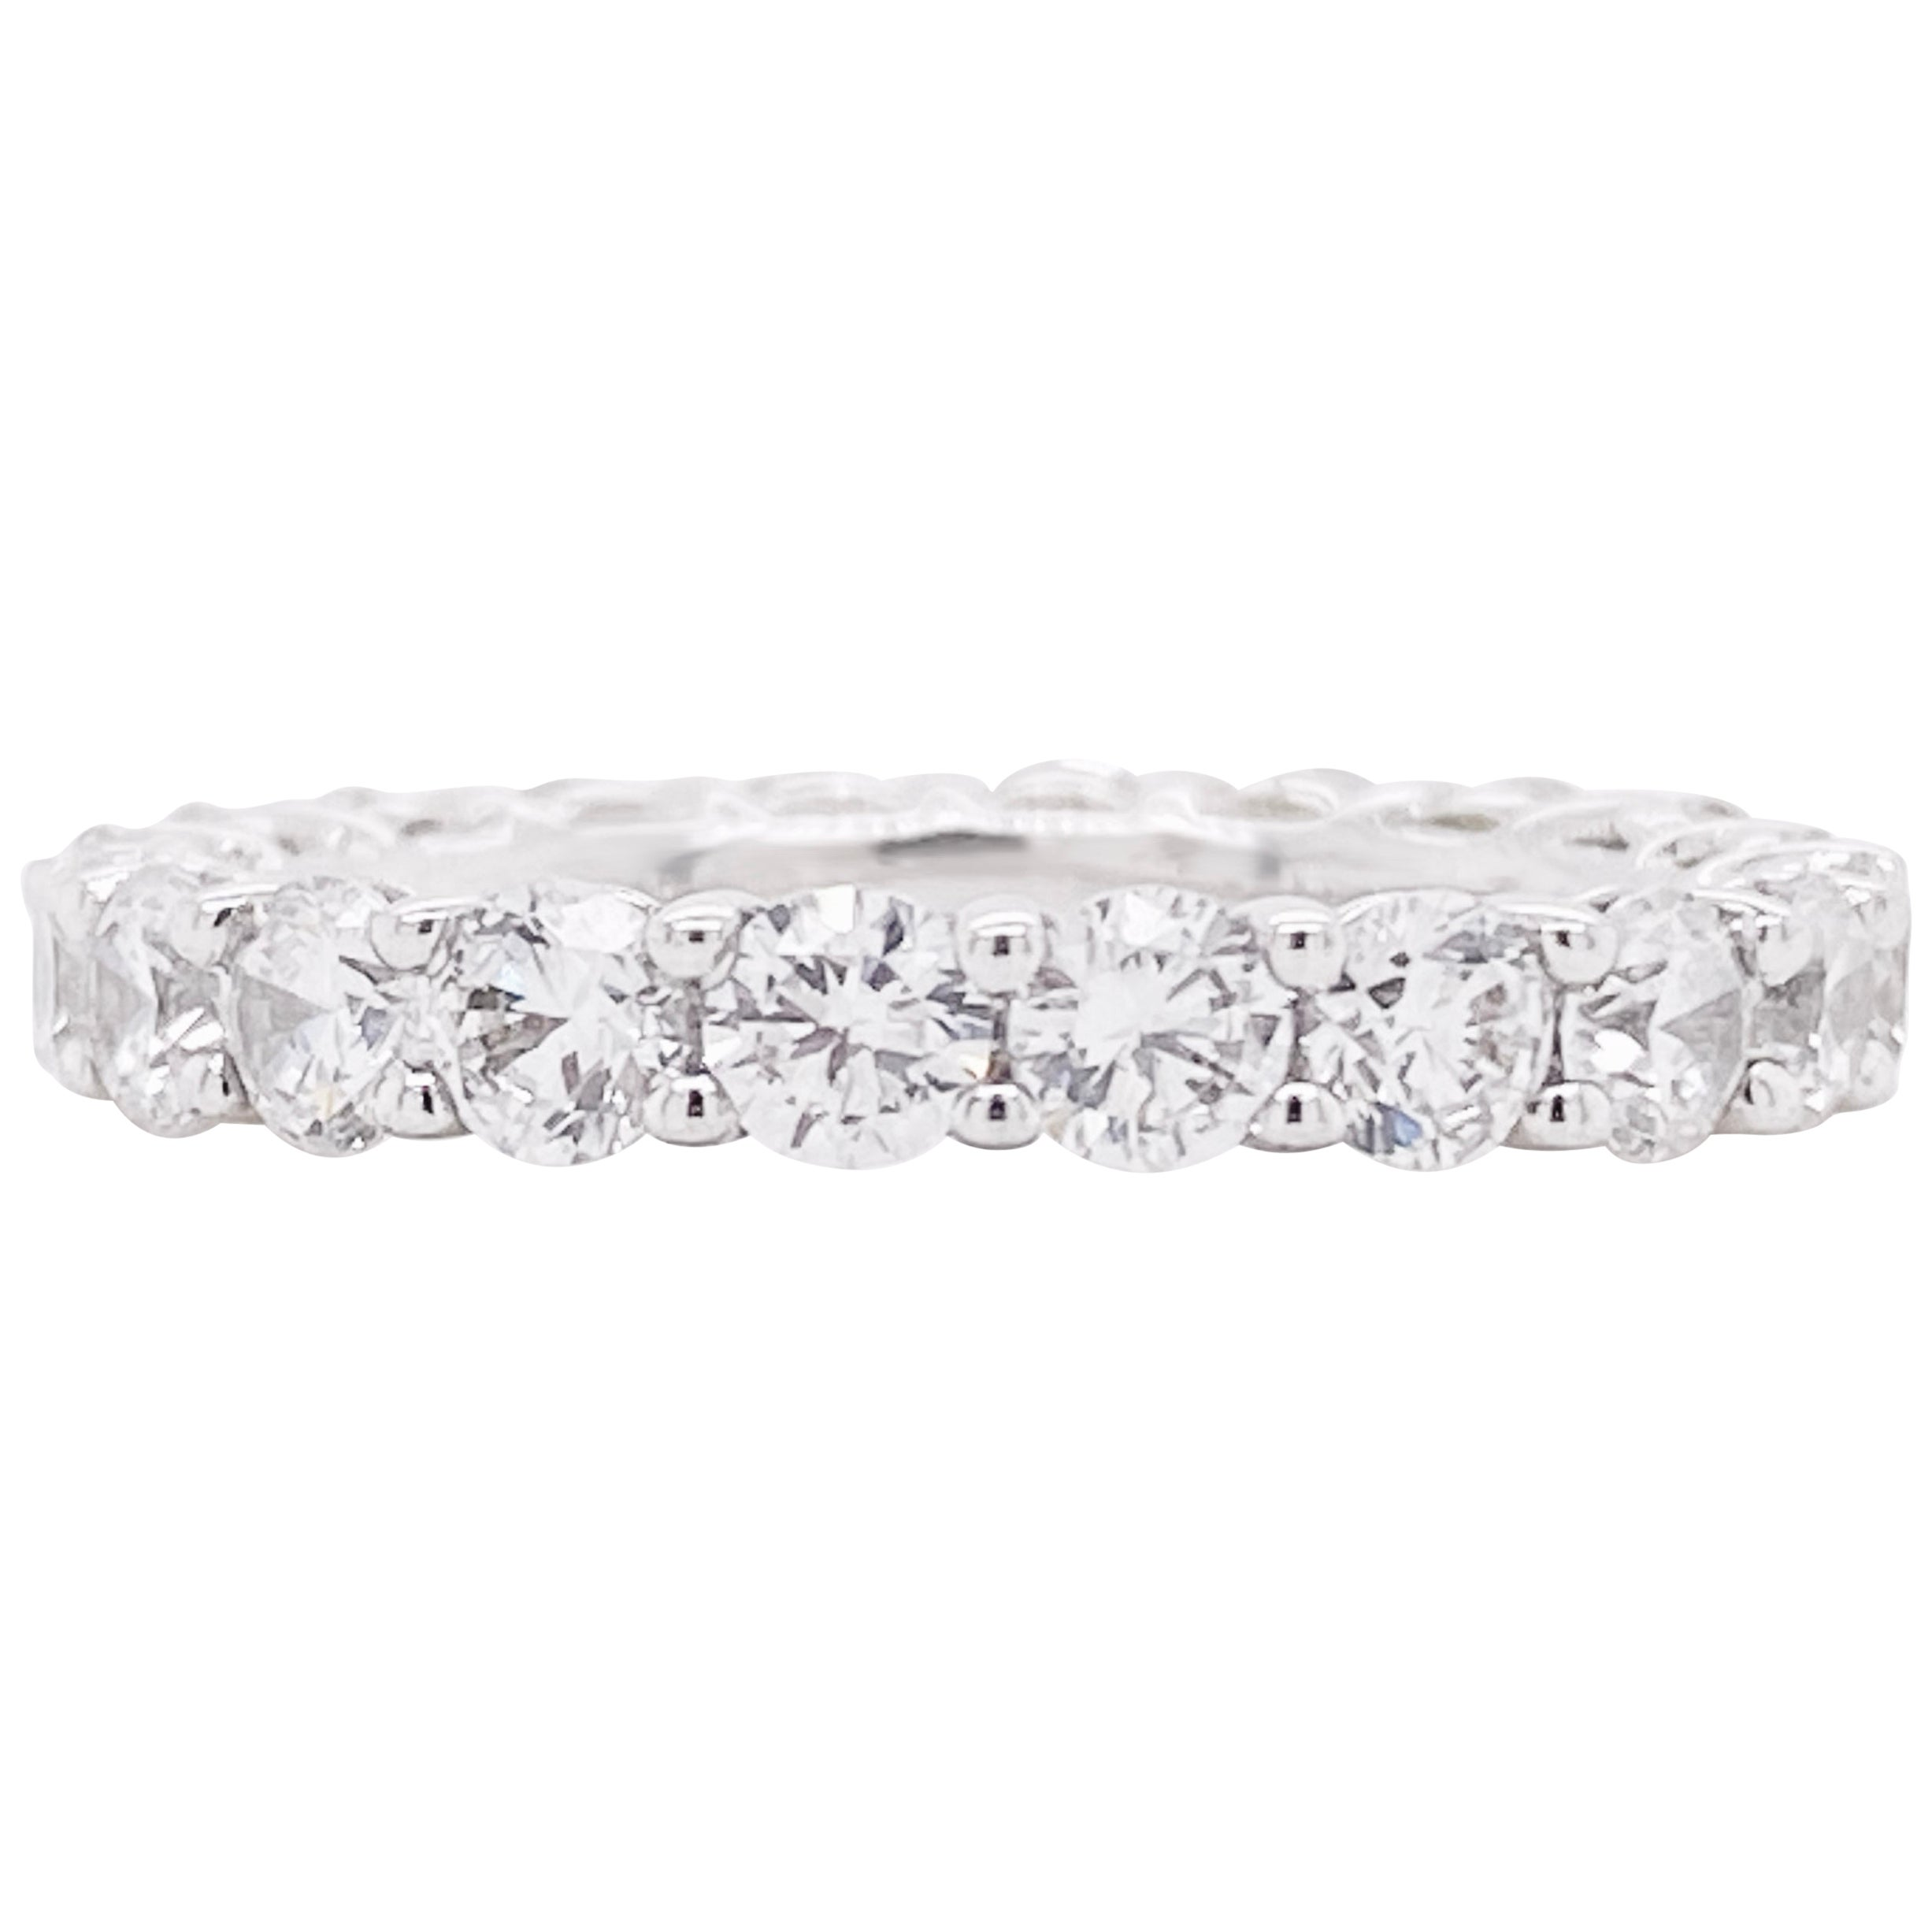 Diamond Band Ring, Eternity Band, 14 Karat White Gold, Wedding, Fashion